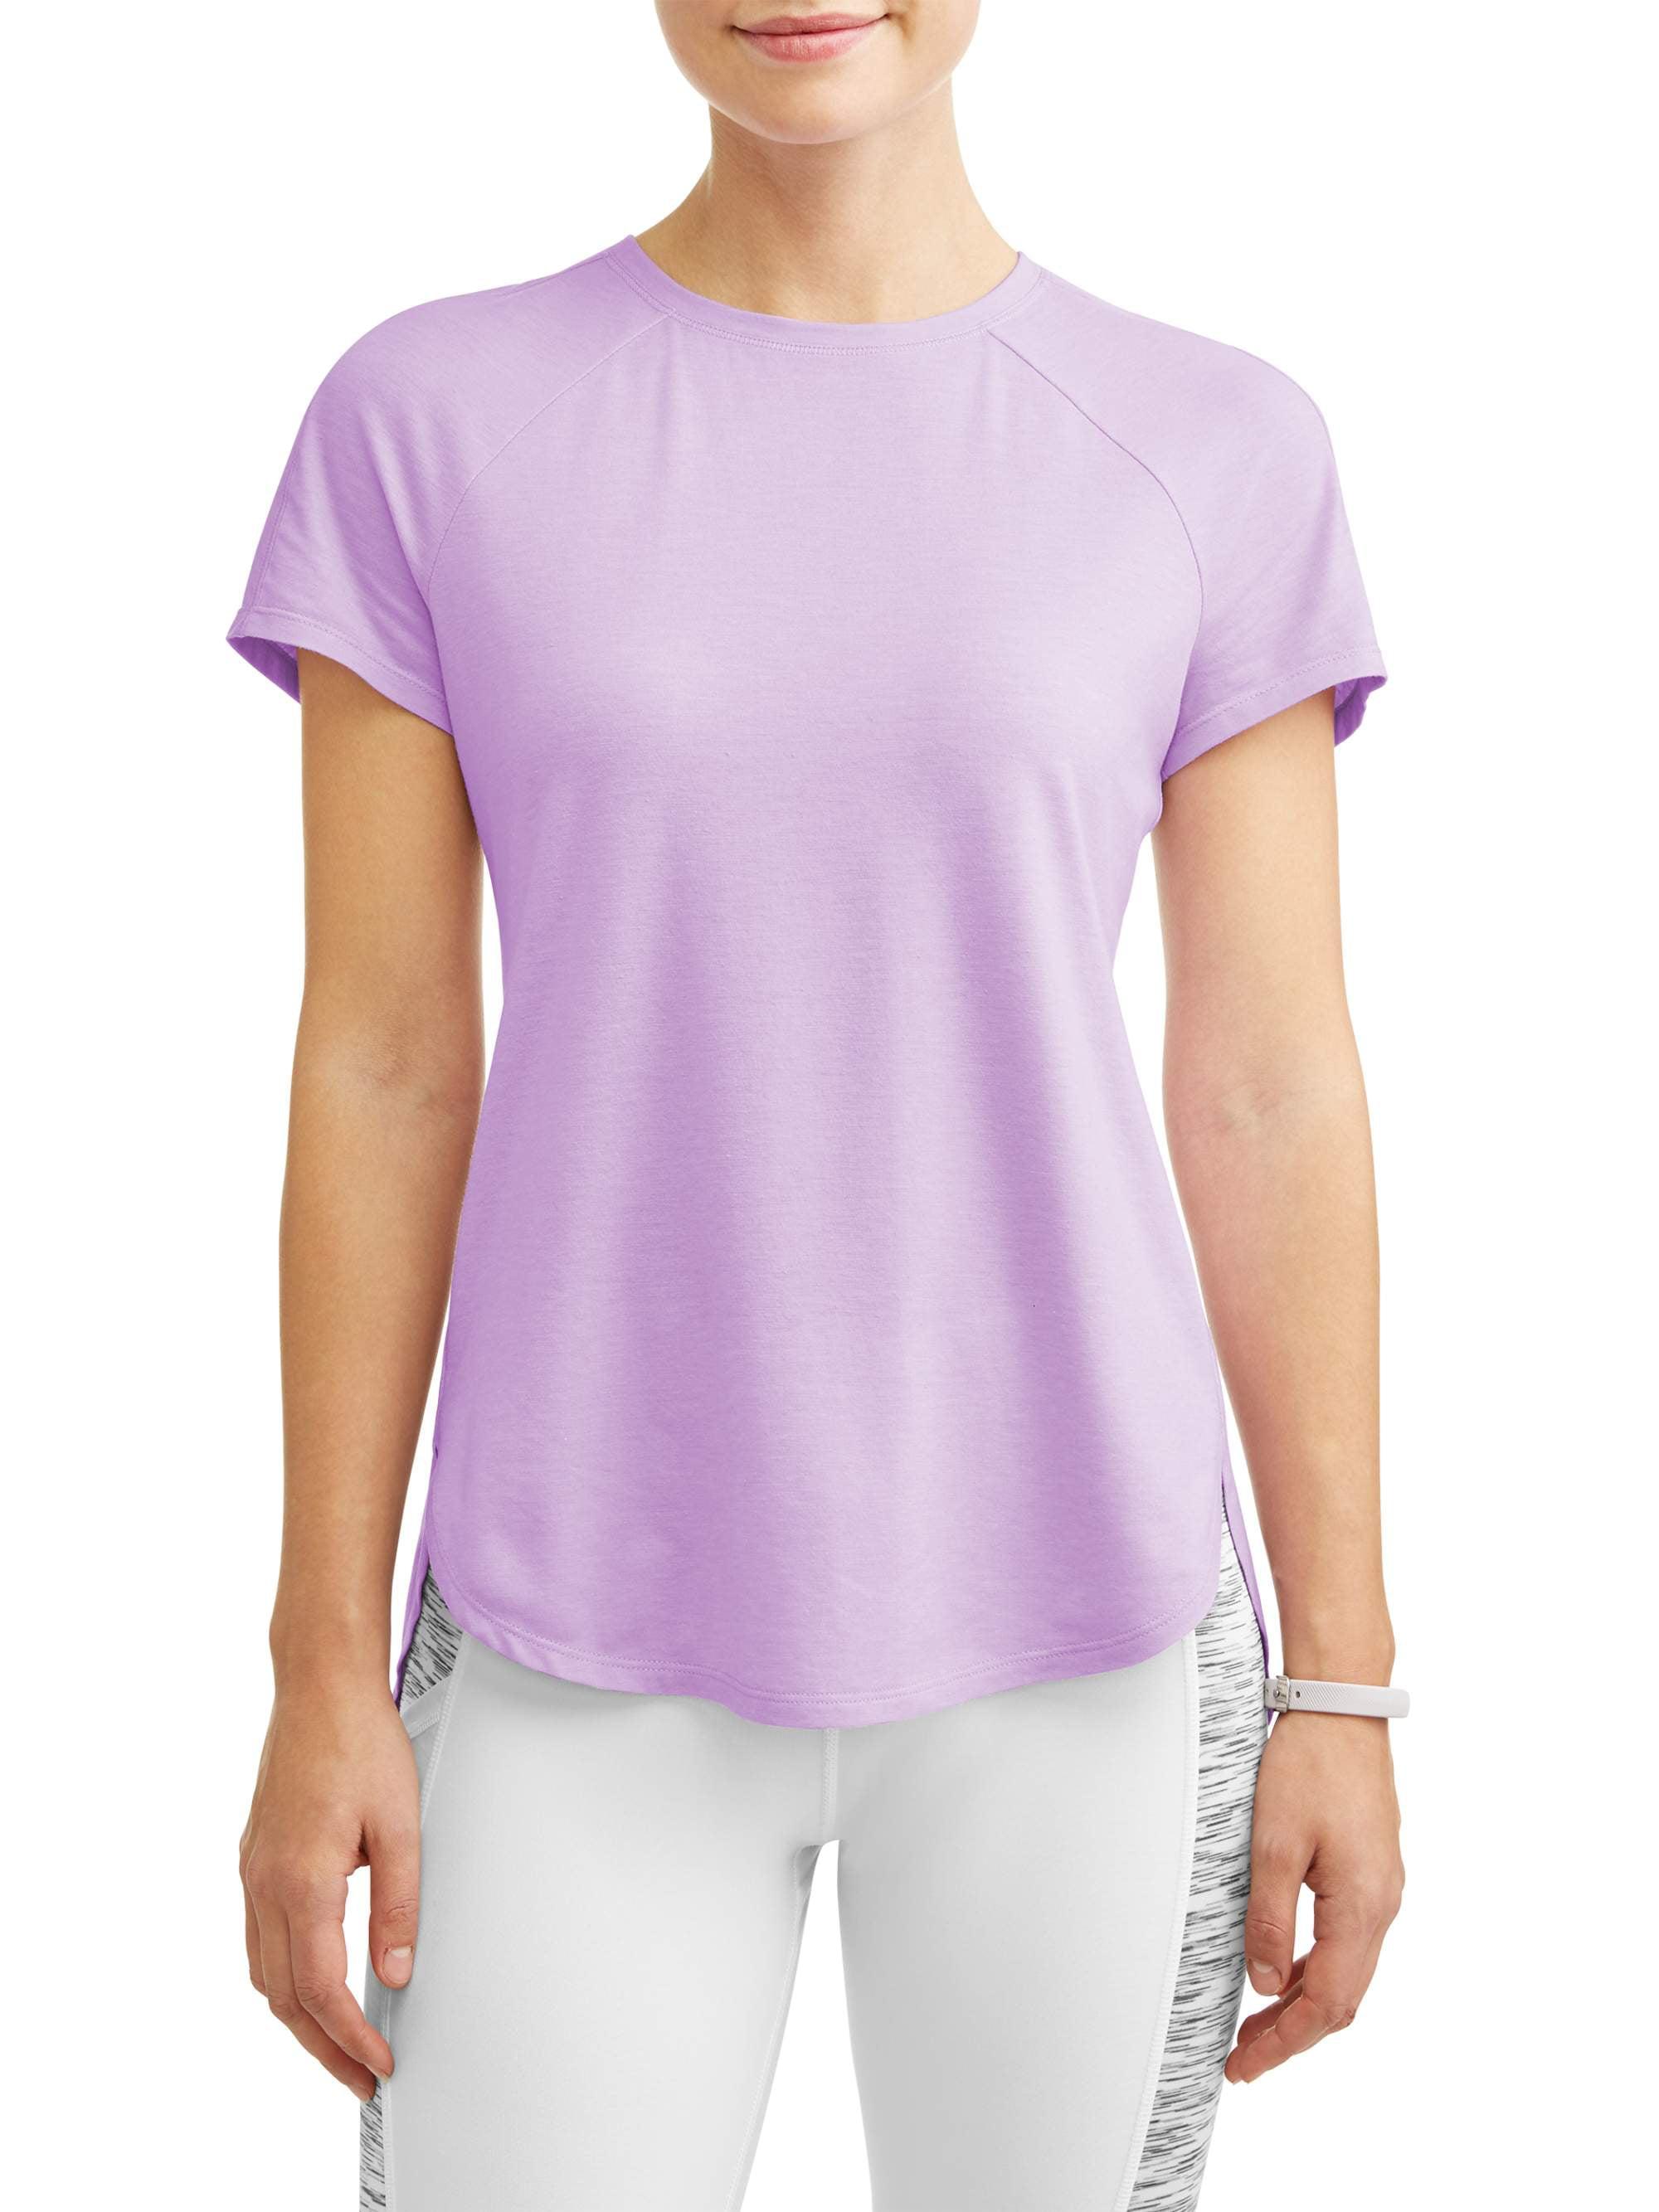 67af2dbfd Avia - Women's Core Active Short Sleeve Tunic Length Performance T-Shirt -  Walmart.com